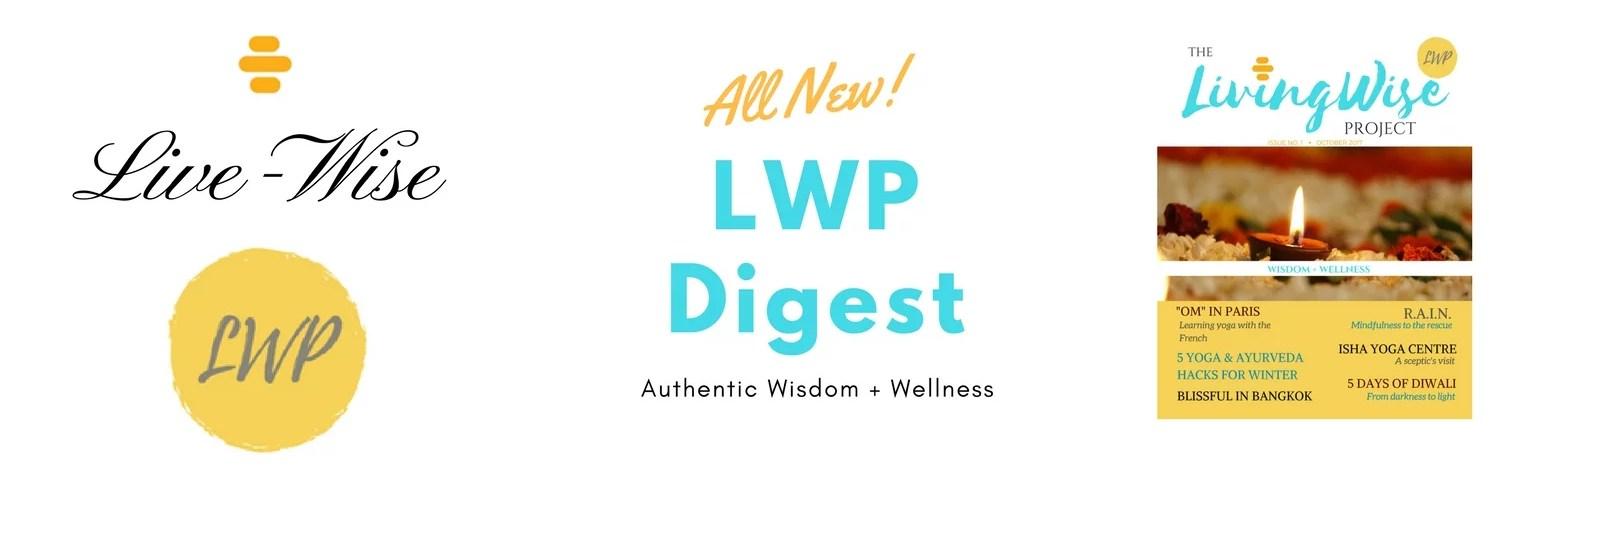 LWP Digest Released